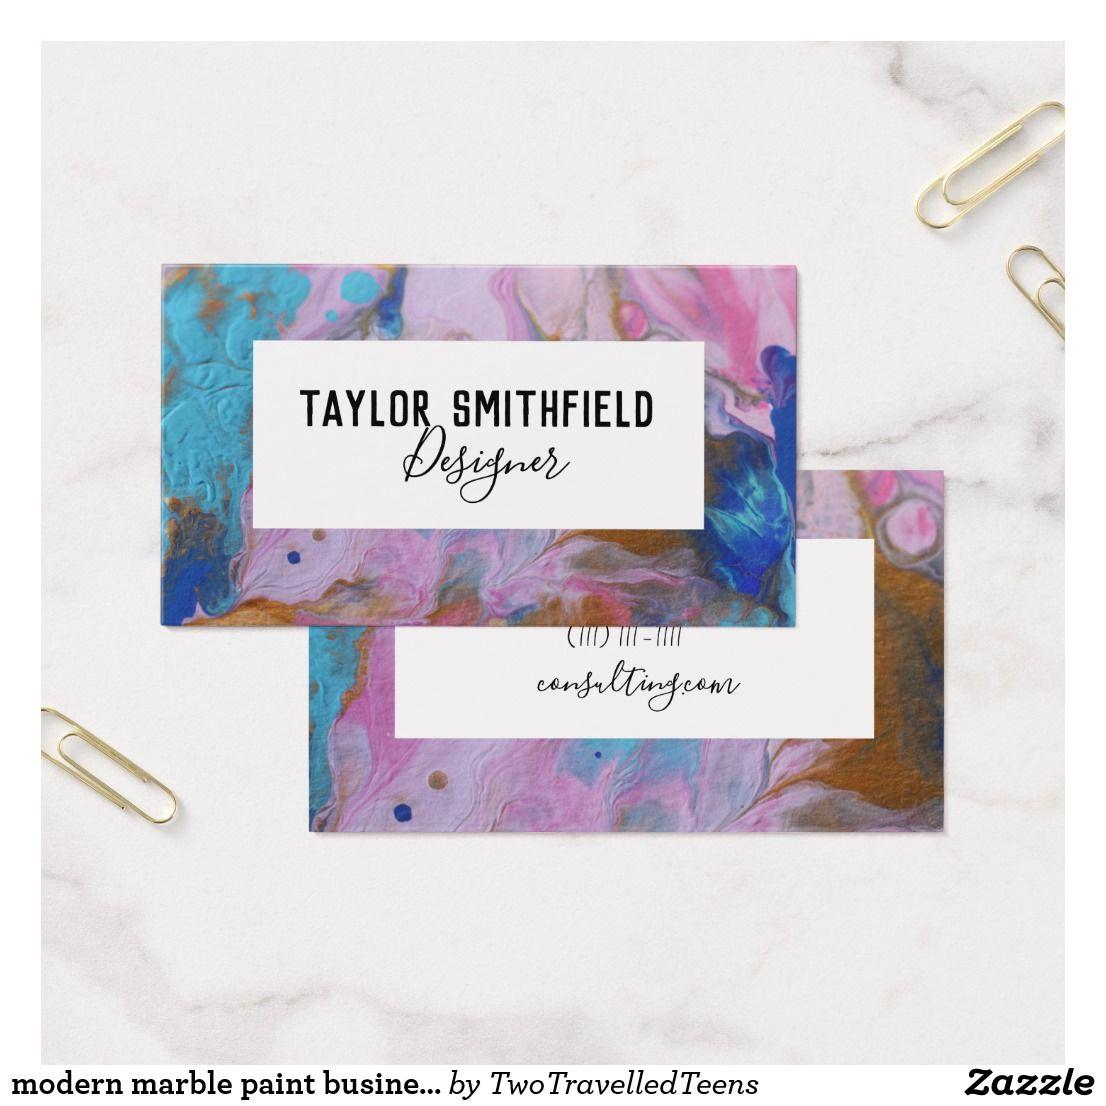 modern marble paint business card design | Business Card Templates ...